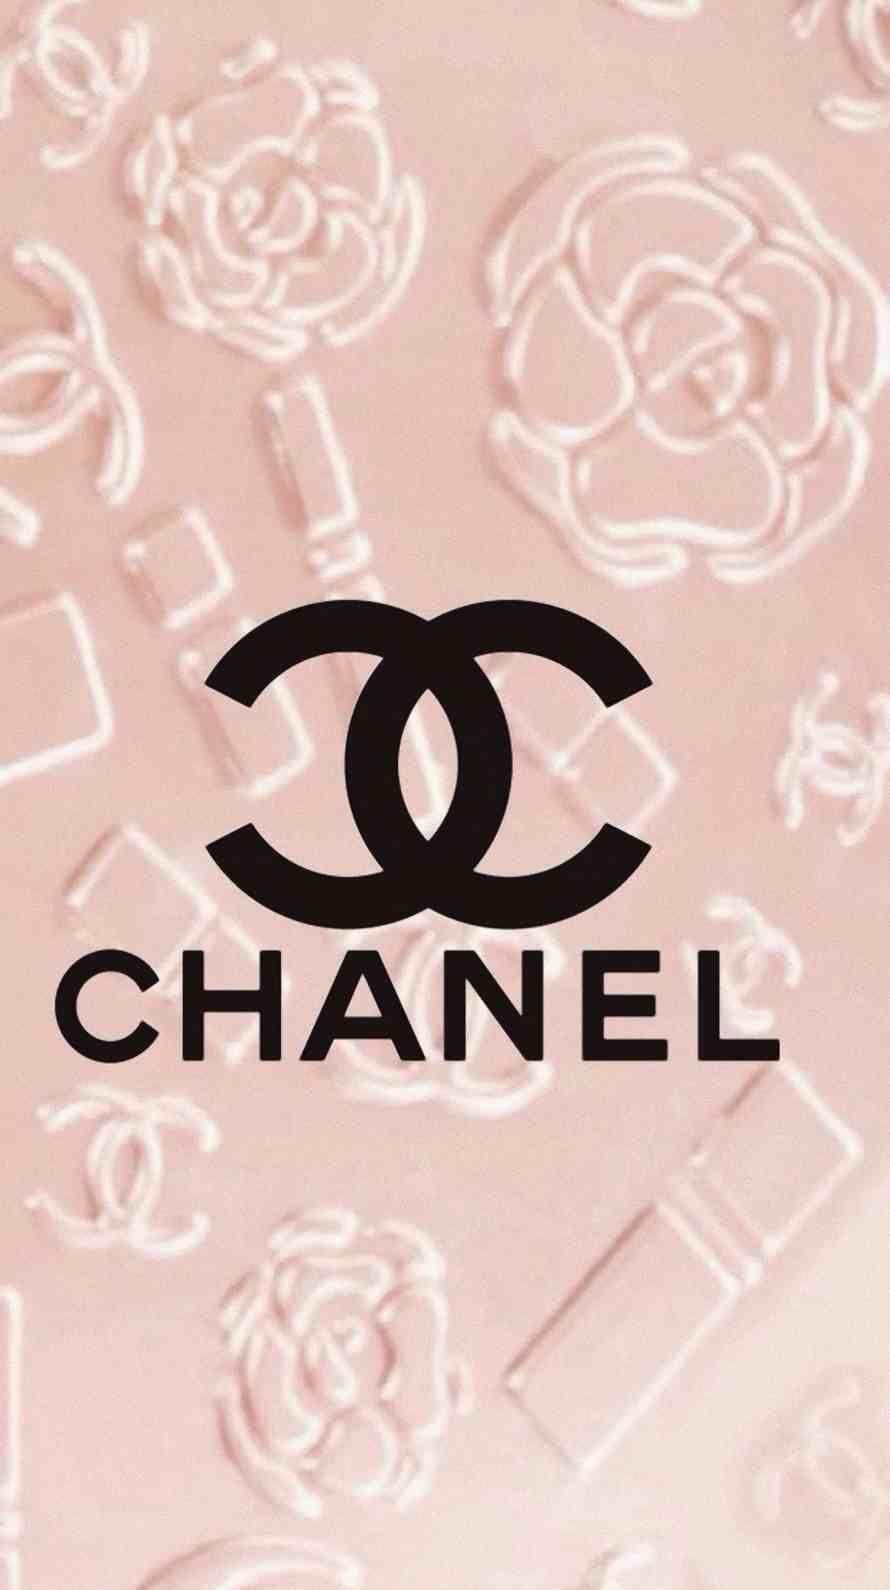 Chanel iPhone Wallpaper | projeto pesquisa | Pinterest